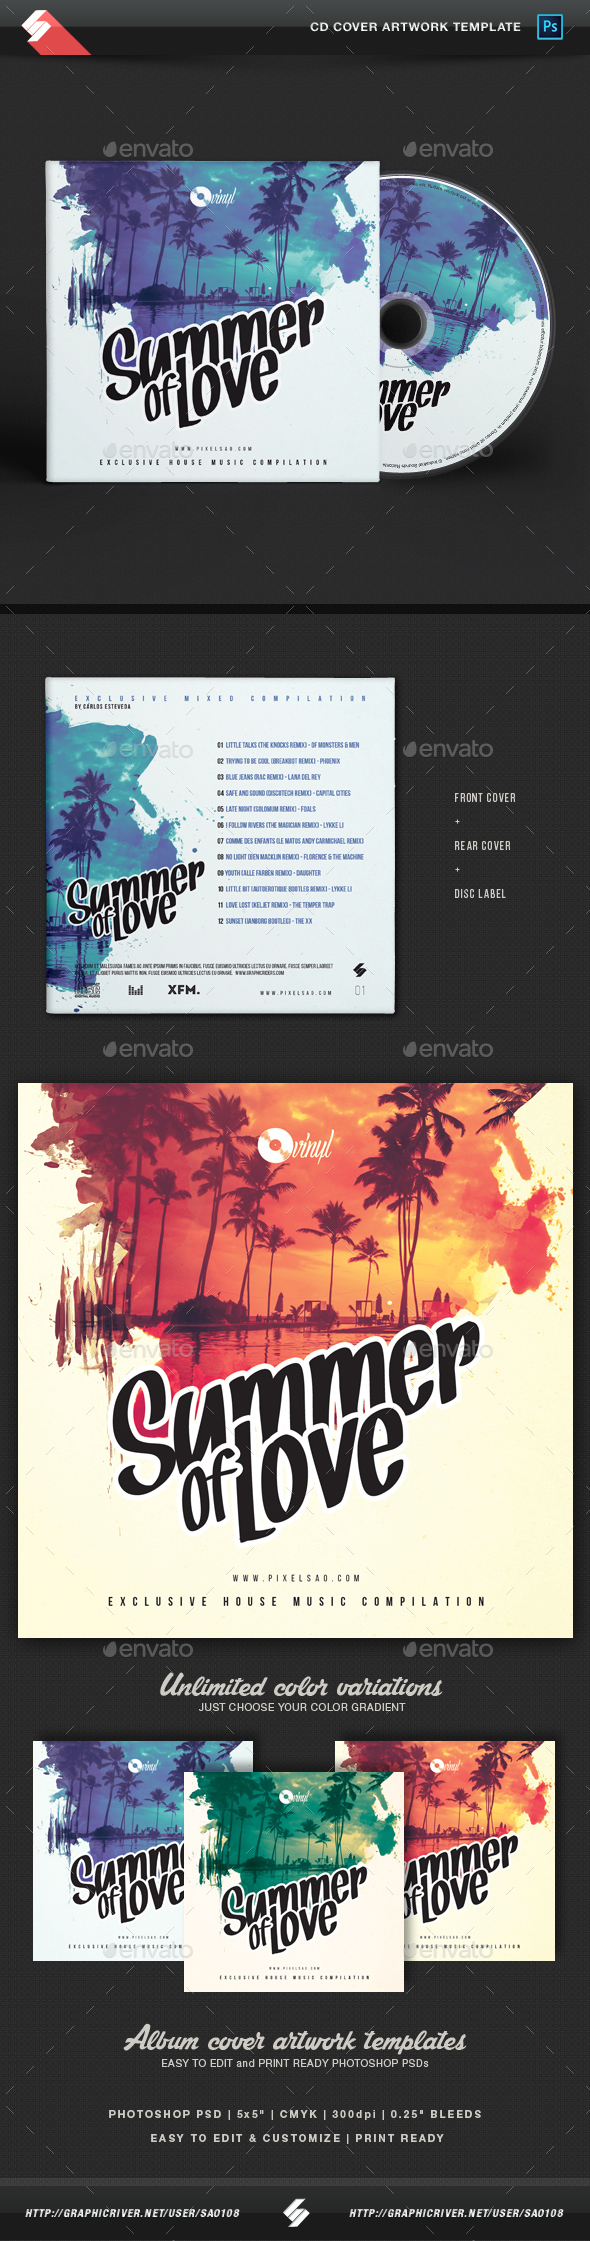 Summer Of Love - CD Cover Artwork Template